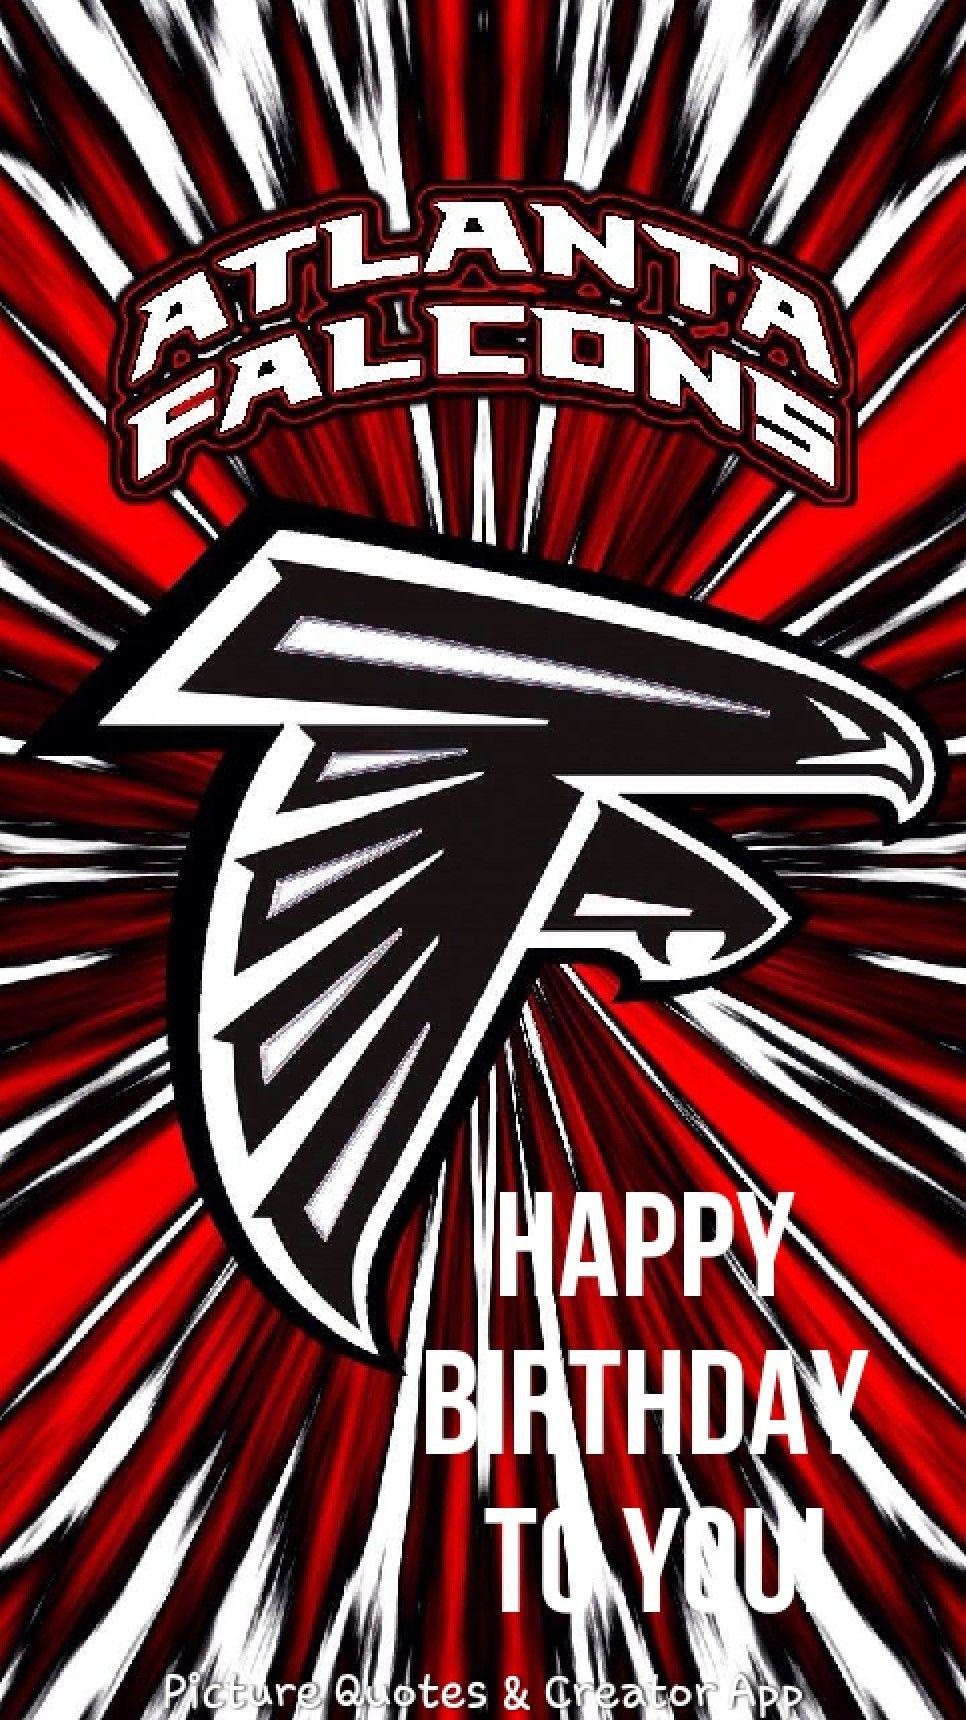 Pin By Tam Tam On Football Team Cakes Bd Wishes Atlanta Falcons Art Atlanta Falcons Football Atlanta Falcons Logo